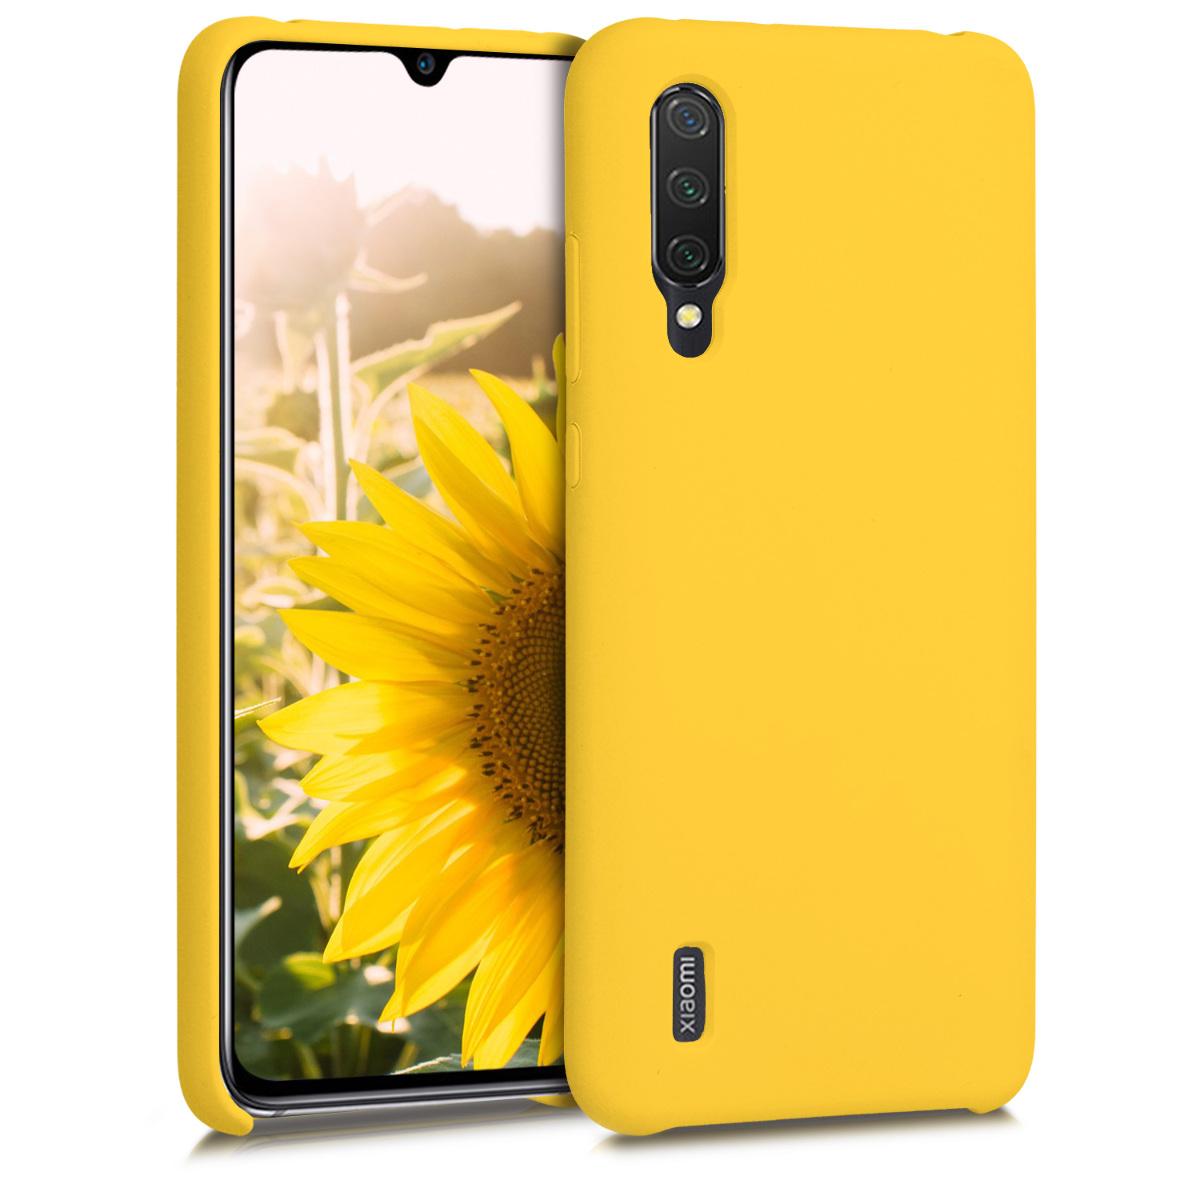 KW Θήκη Σιλικόνης Xiaomi Mi 9 Lite - Soft Flexible Rubber Protective Cover - Honey Yellow (50585.143)